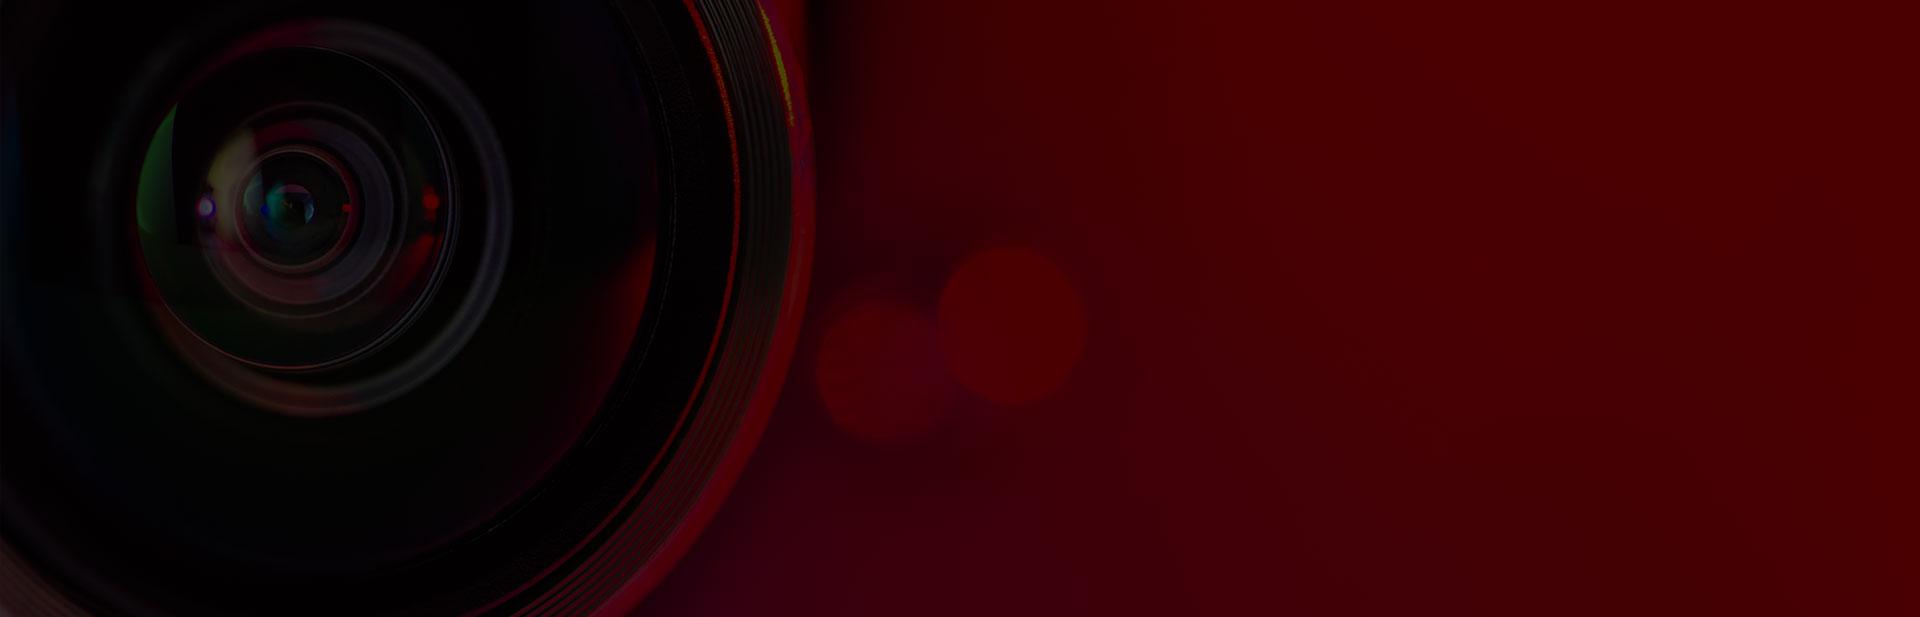 Installation videosurveillance oise compiegne Realise